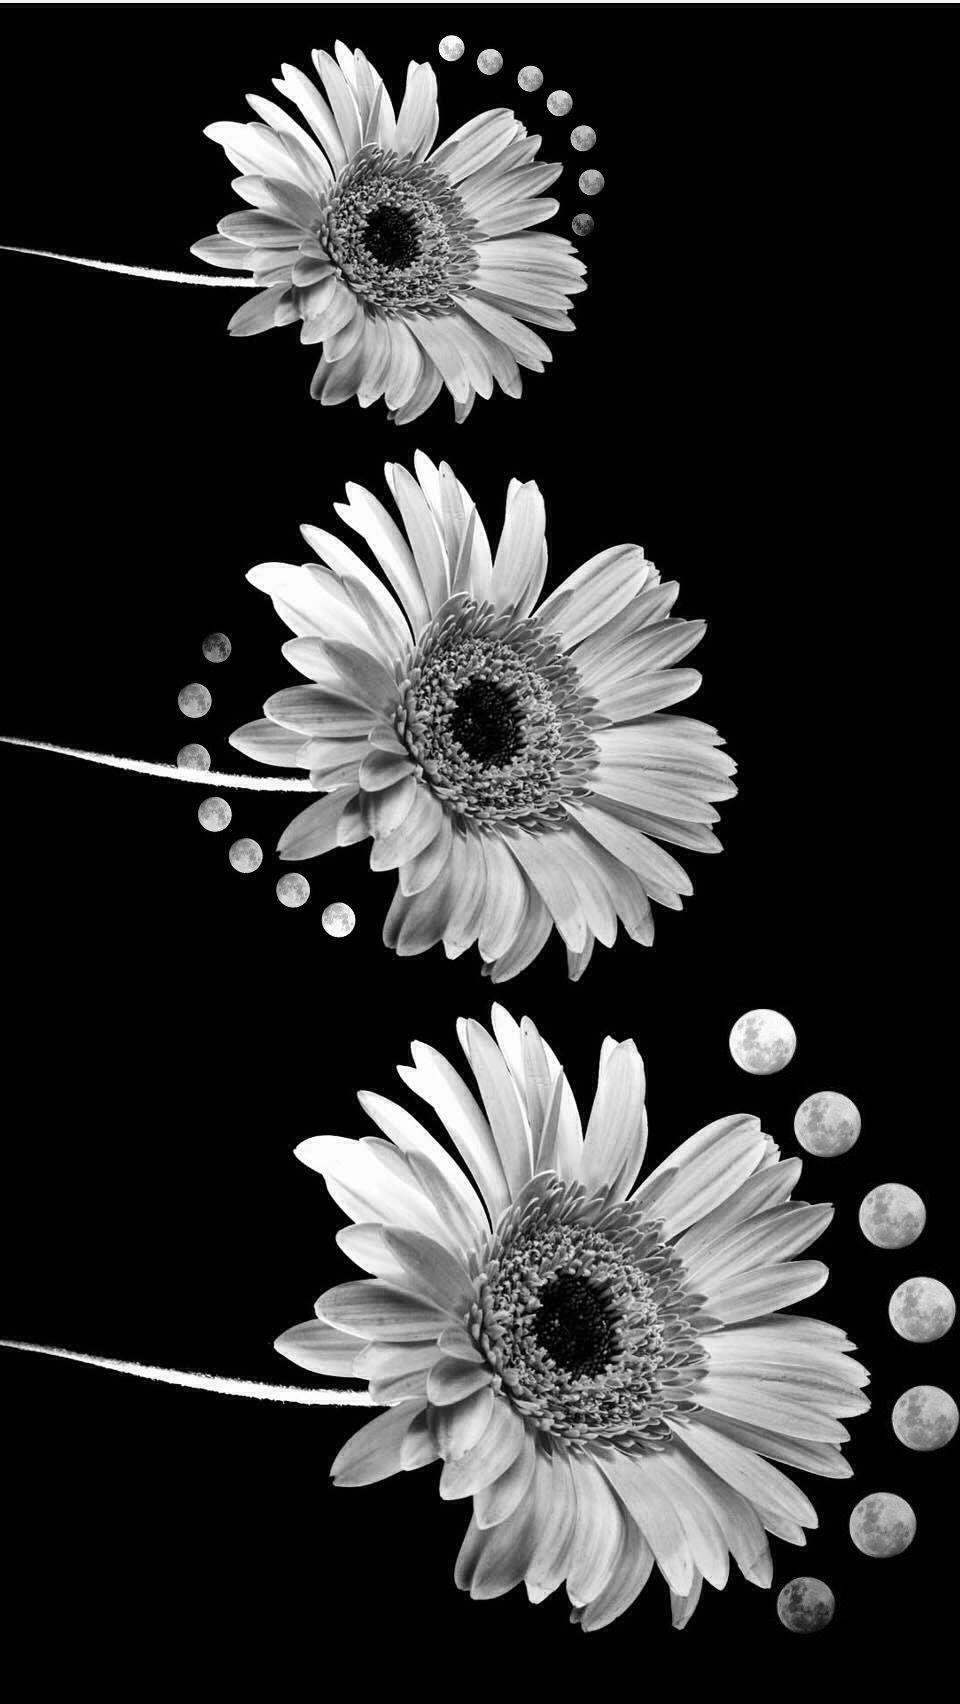 Flower Madelief Moon Blackandwhite Background Interesti